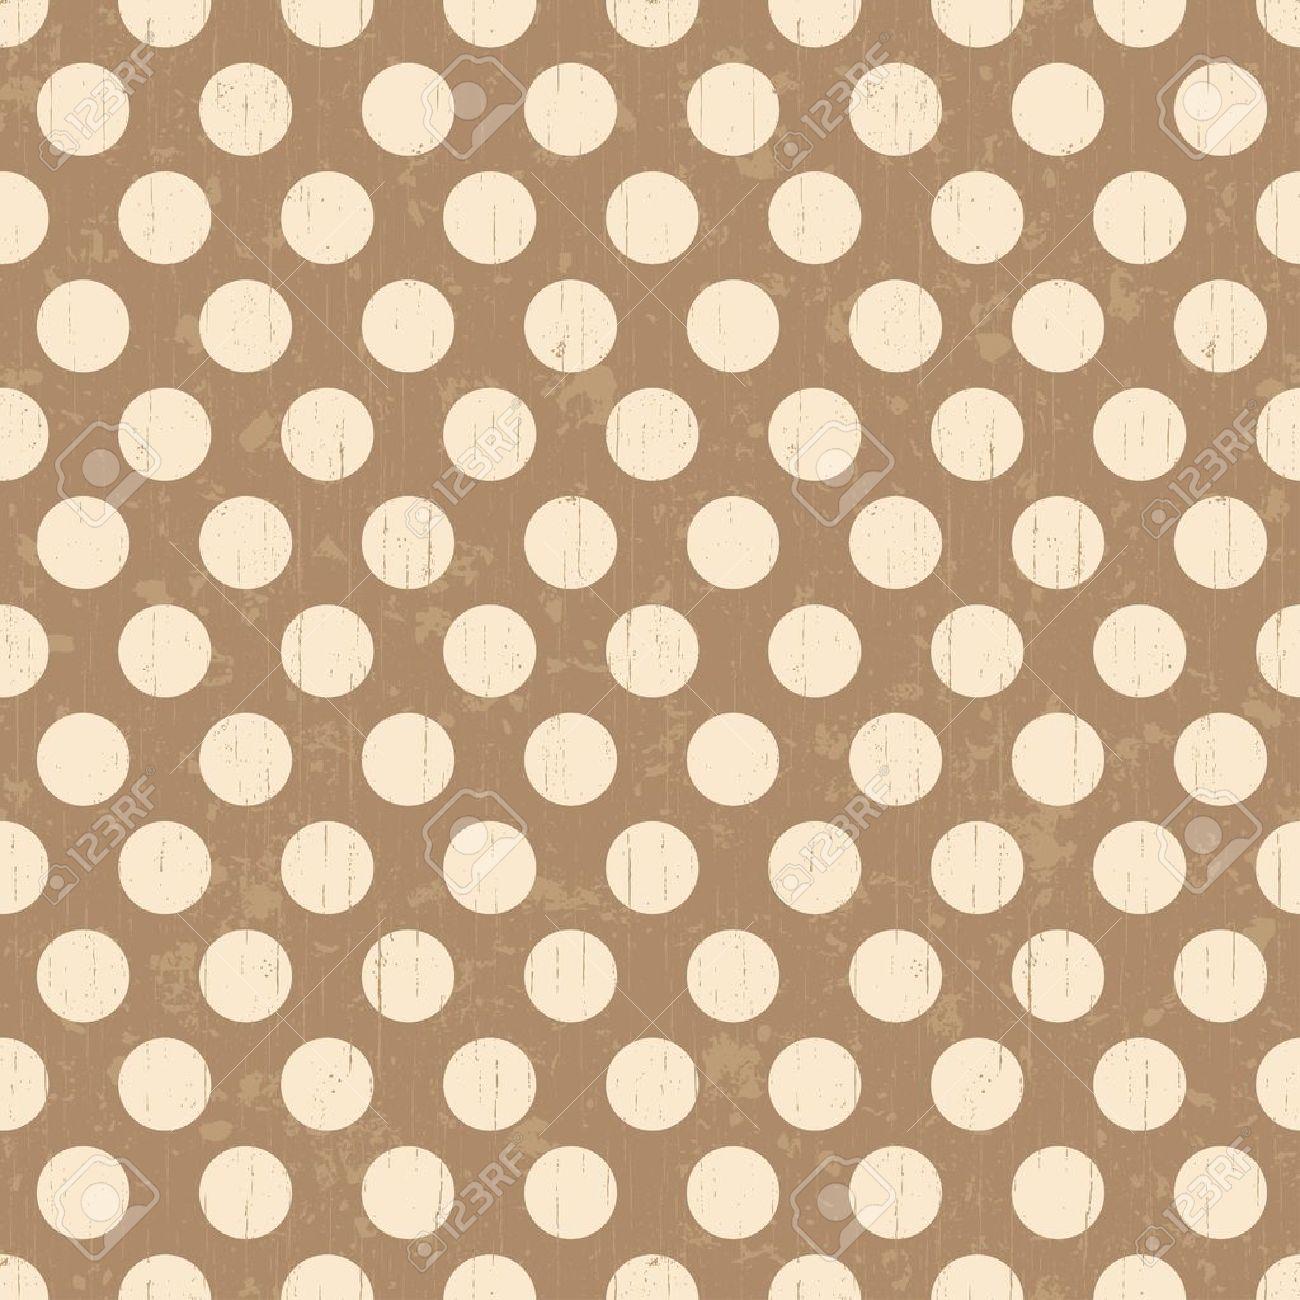 Seamless grunge circles polka dots background texture Stock Vector - 20778442